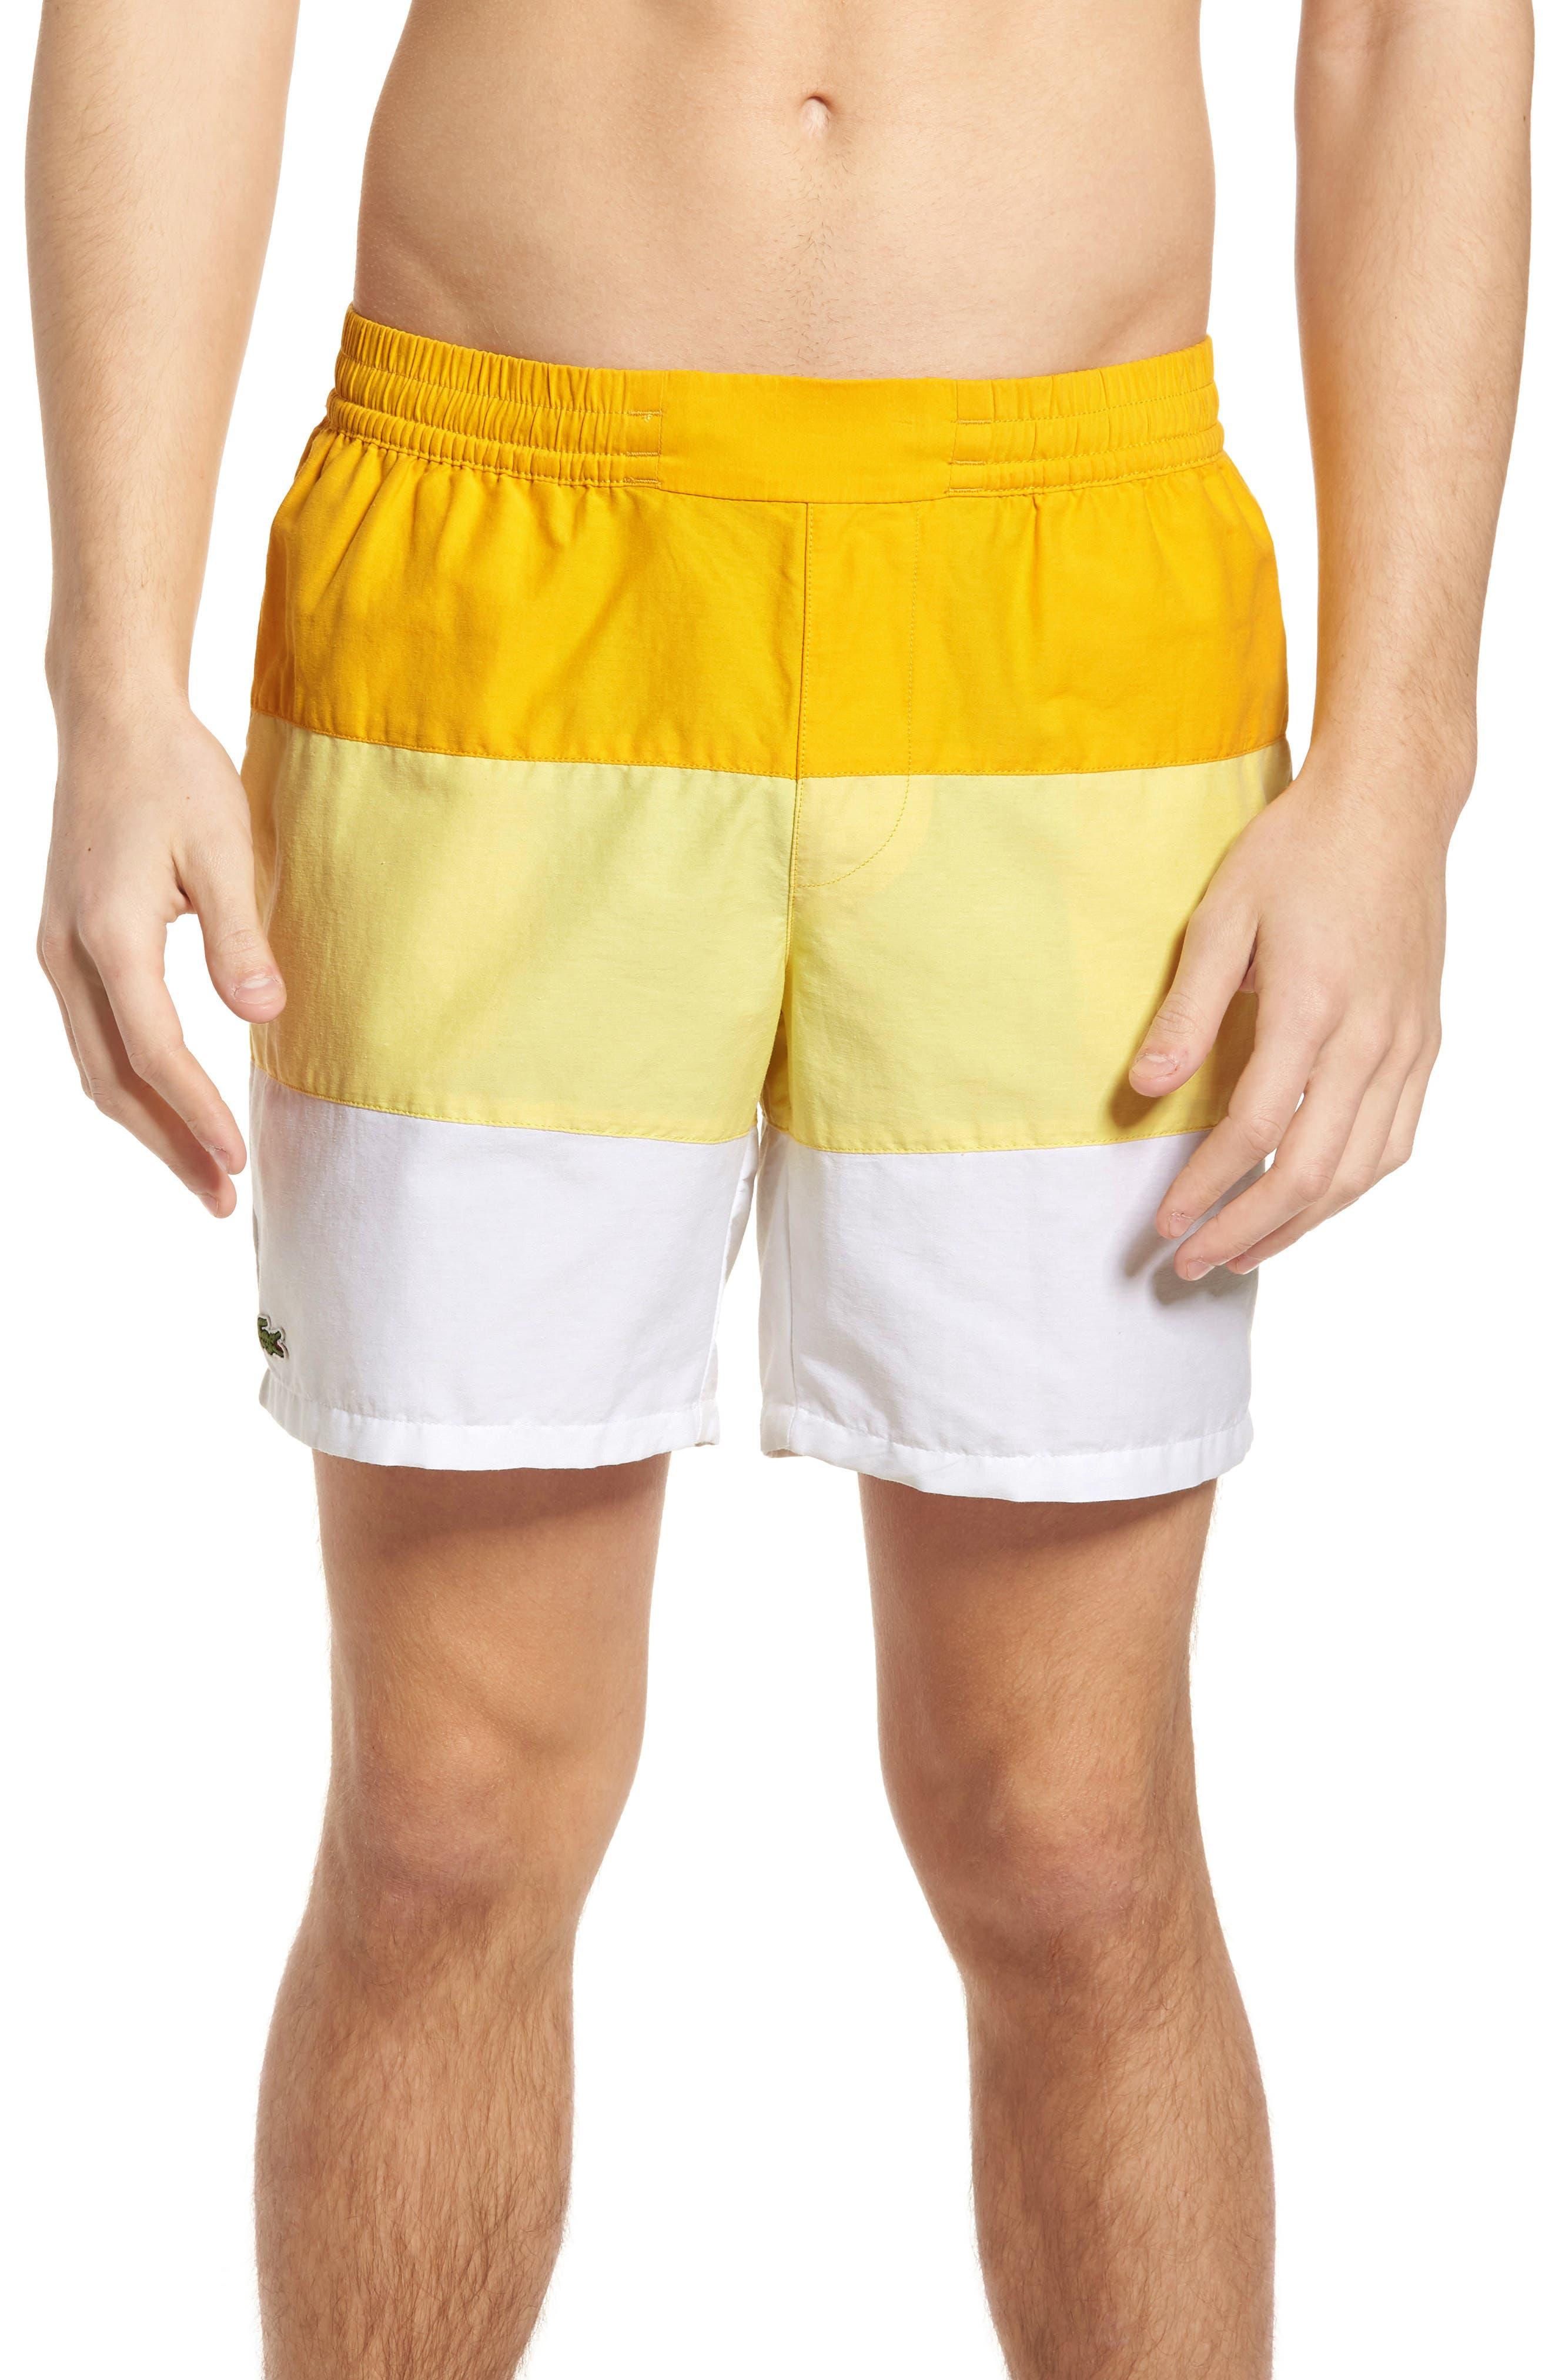 Alternate Image 1 Selected - Lacoste Colorblock Swim Trunks